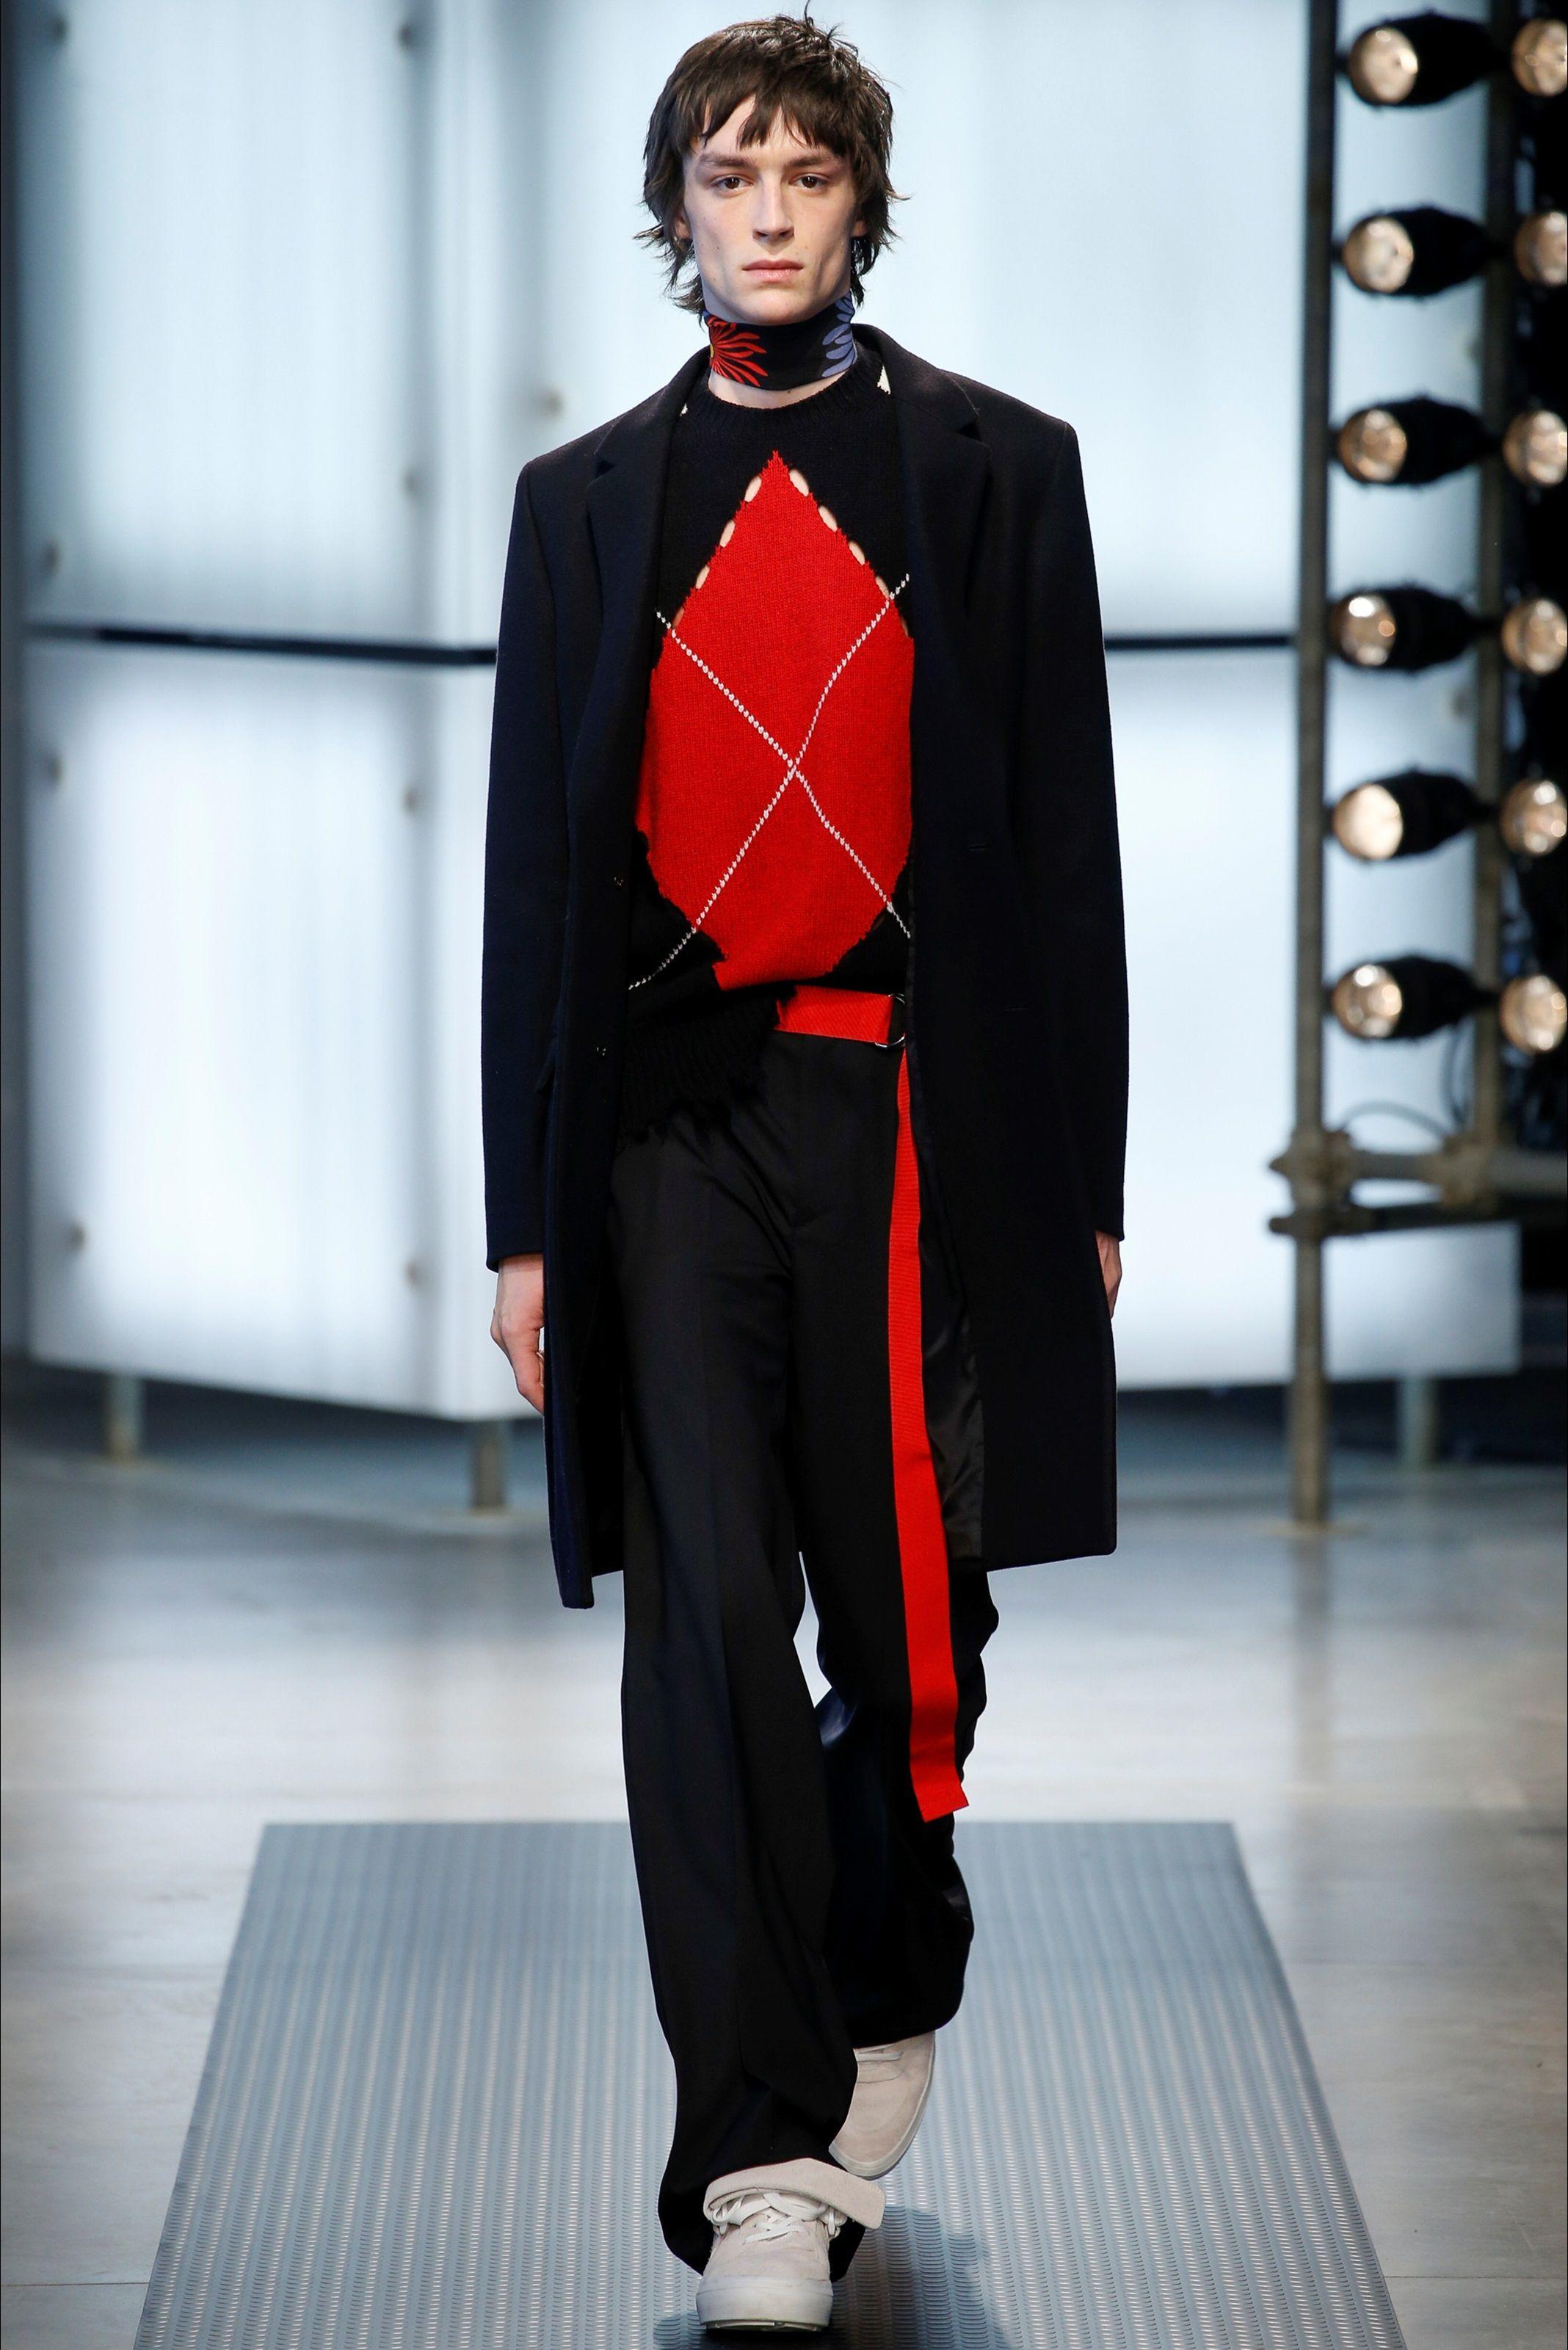 Sfilata Moda Uomo MSGM Milano - Autunno Inverno 2016-17 - Vogue